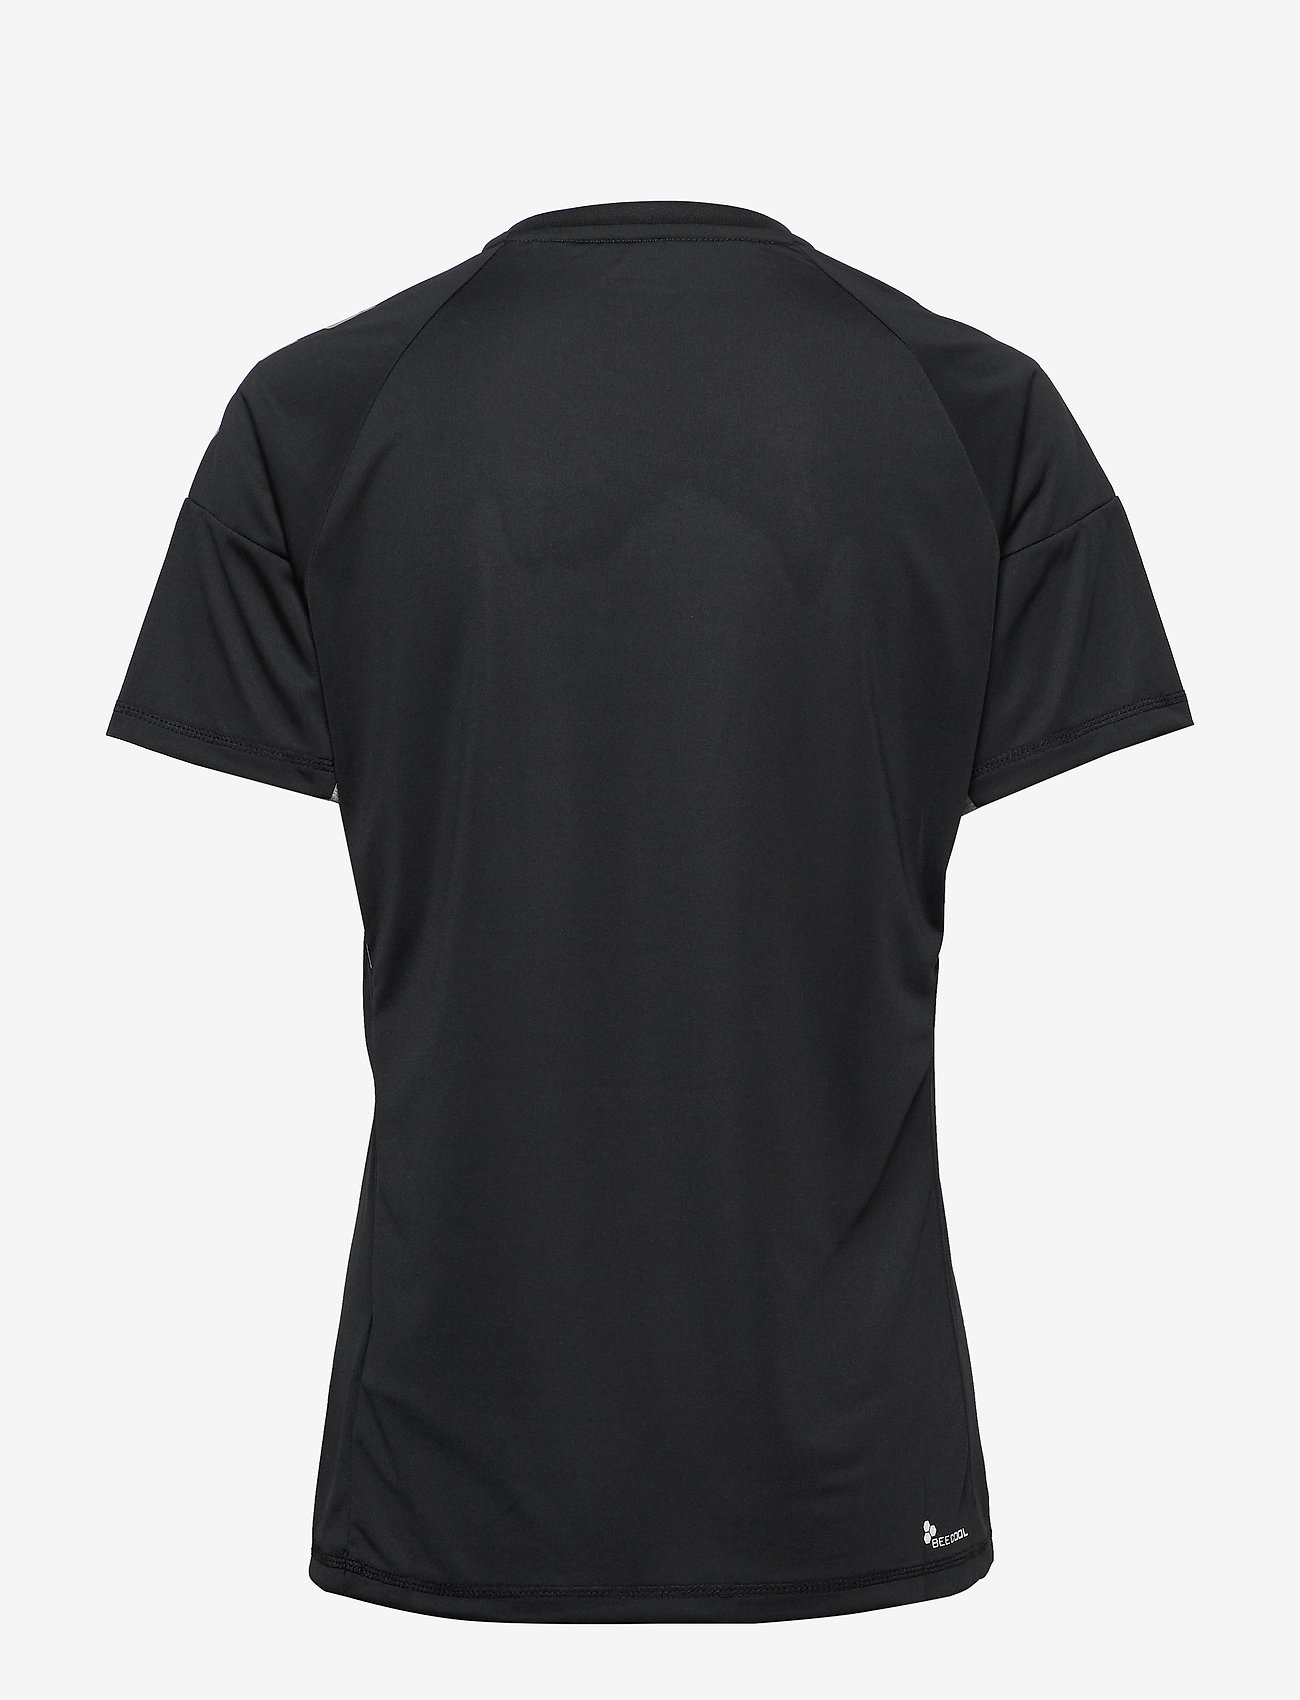 Hummel - TECH MOVE JERSEY WOMAN S/S - football shirts - black - 1